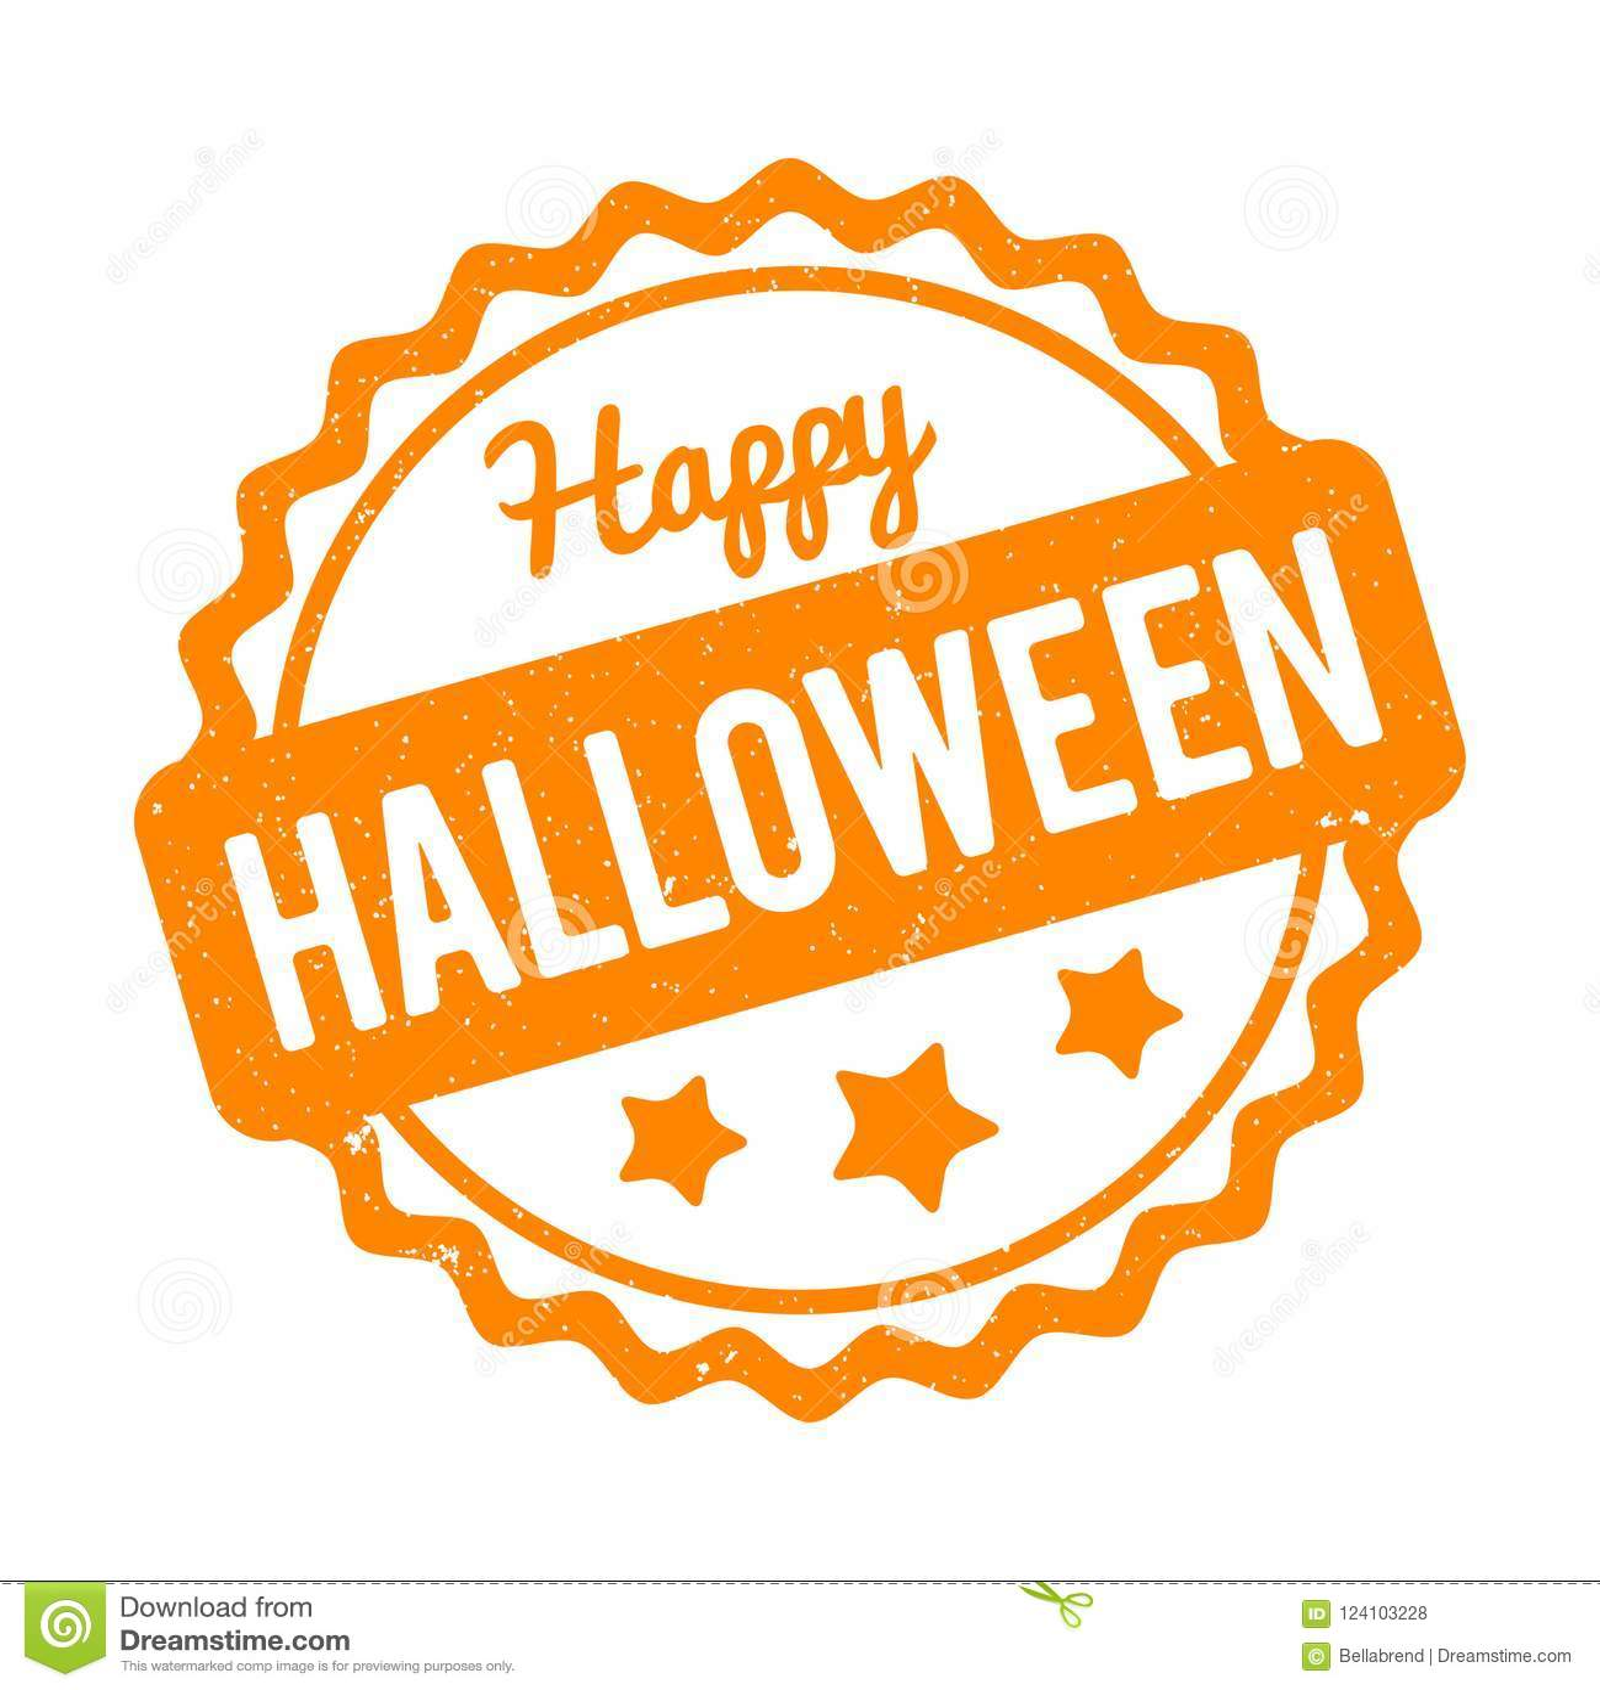 Happy Halloween rubber stamp orange on a white background.